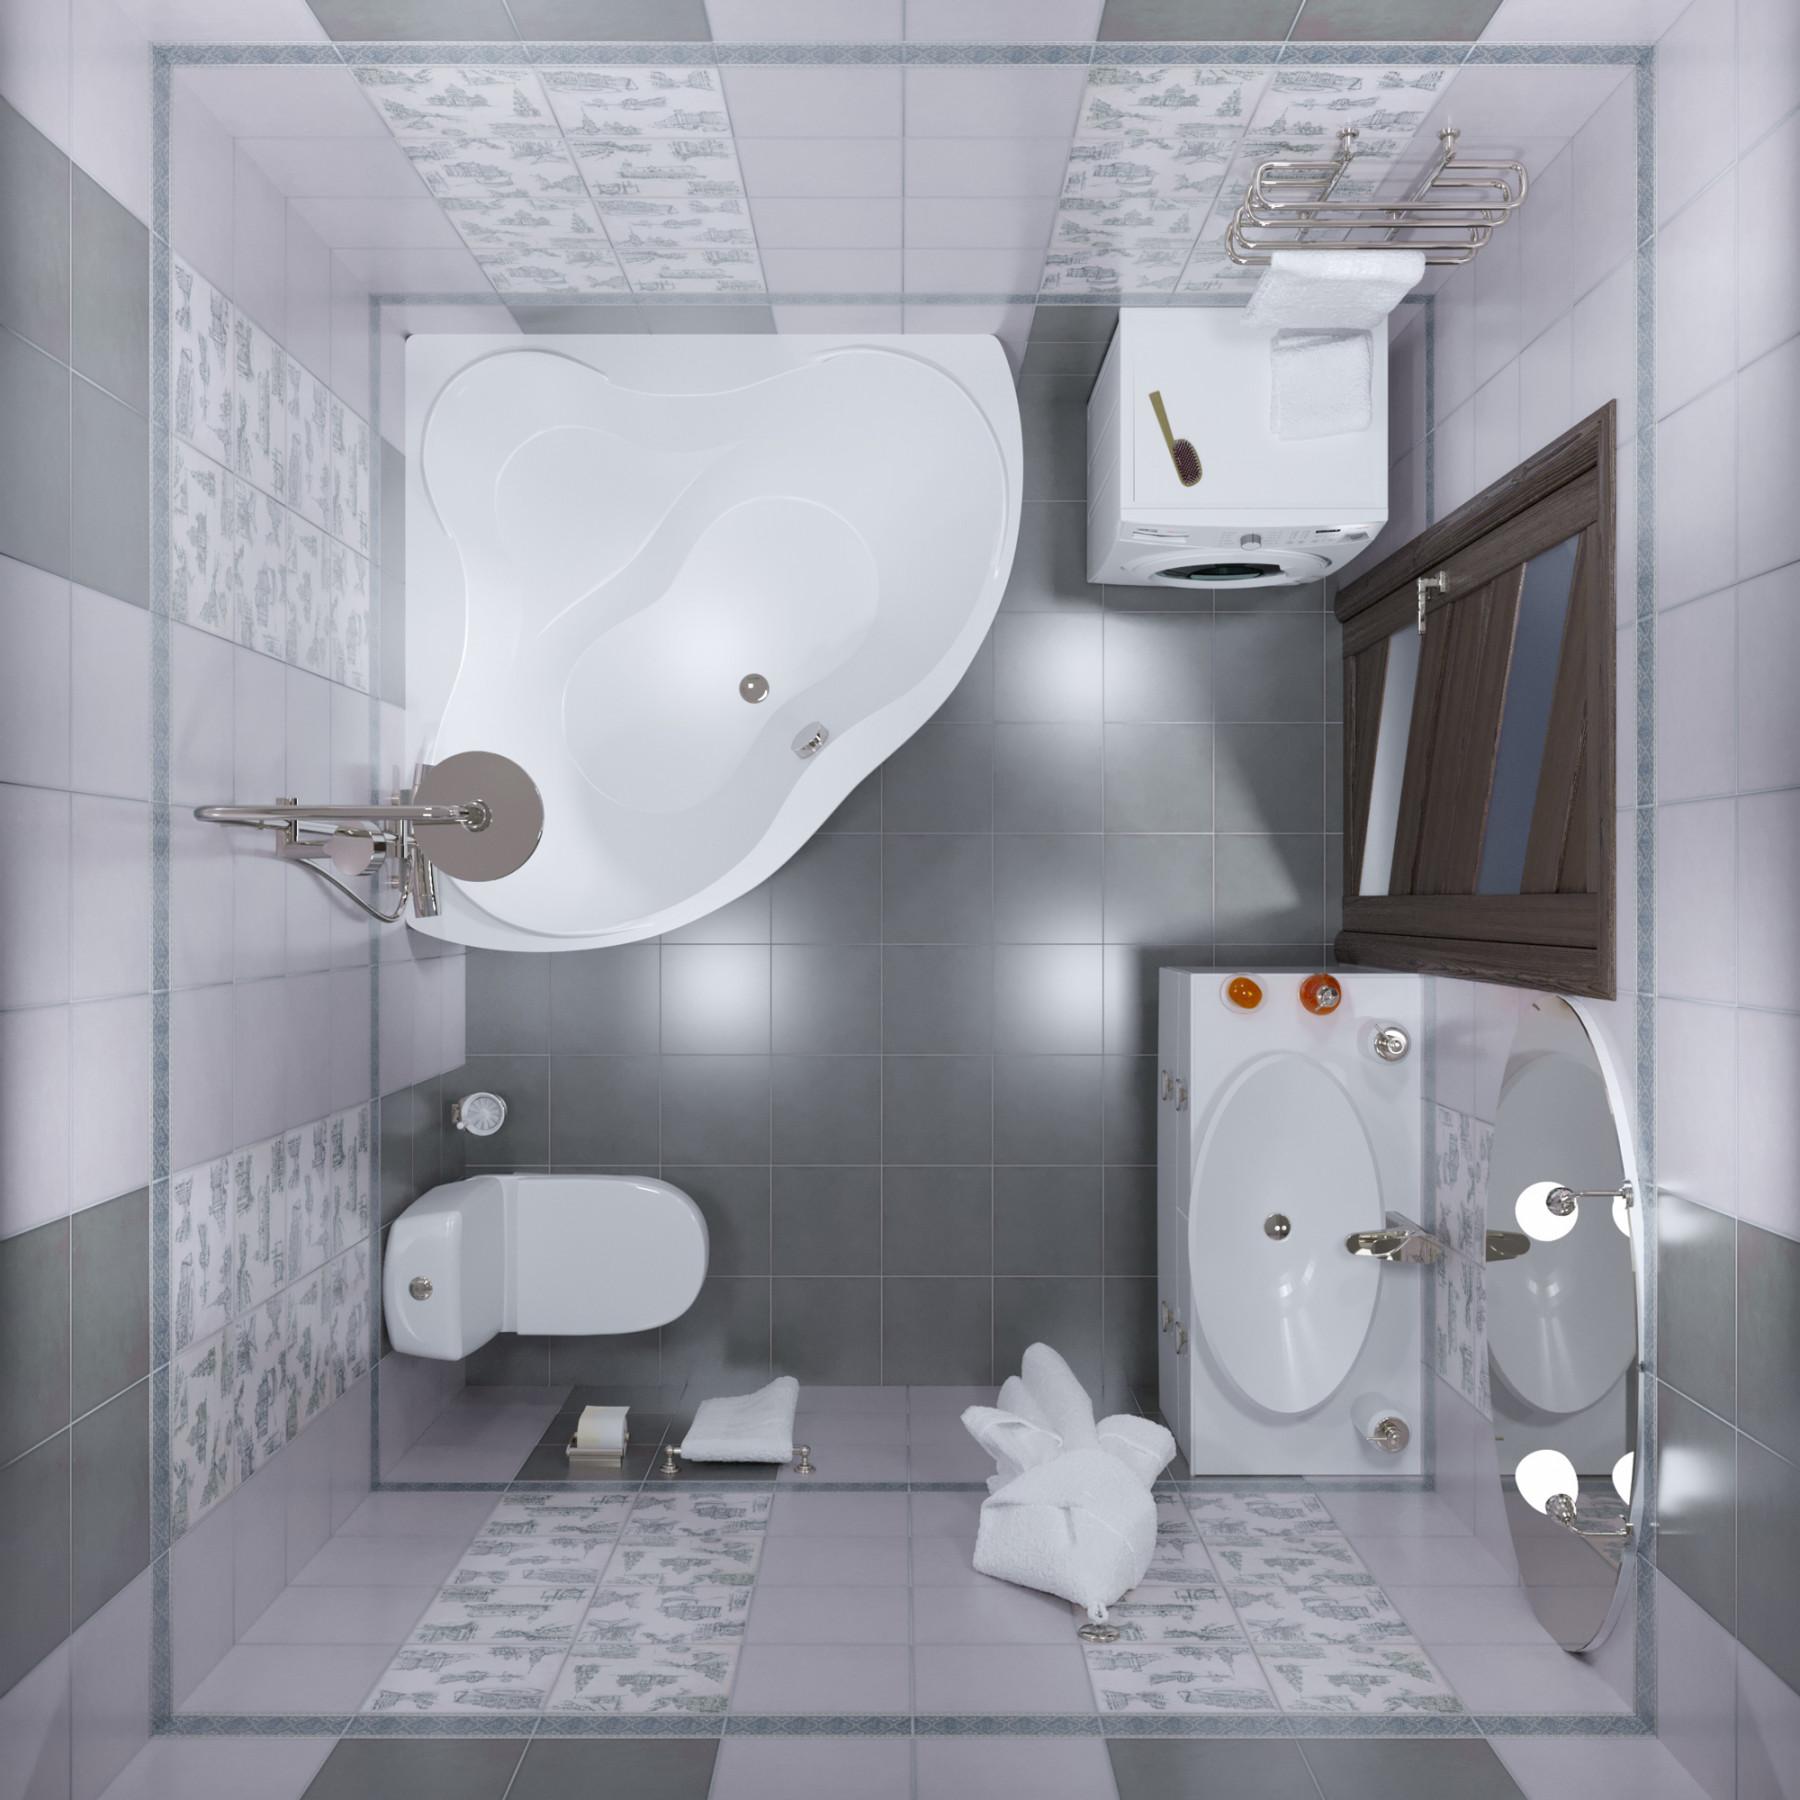 Акриловая ванна Triton Медея 142x142